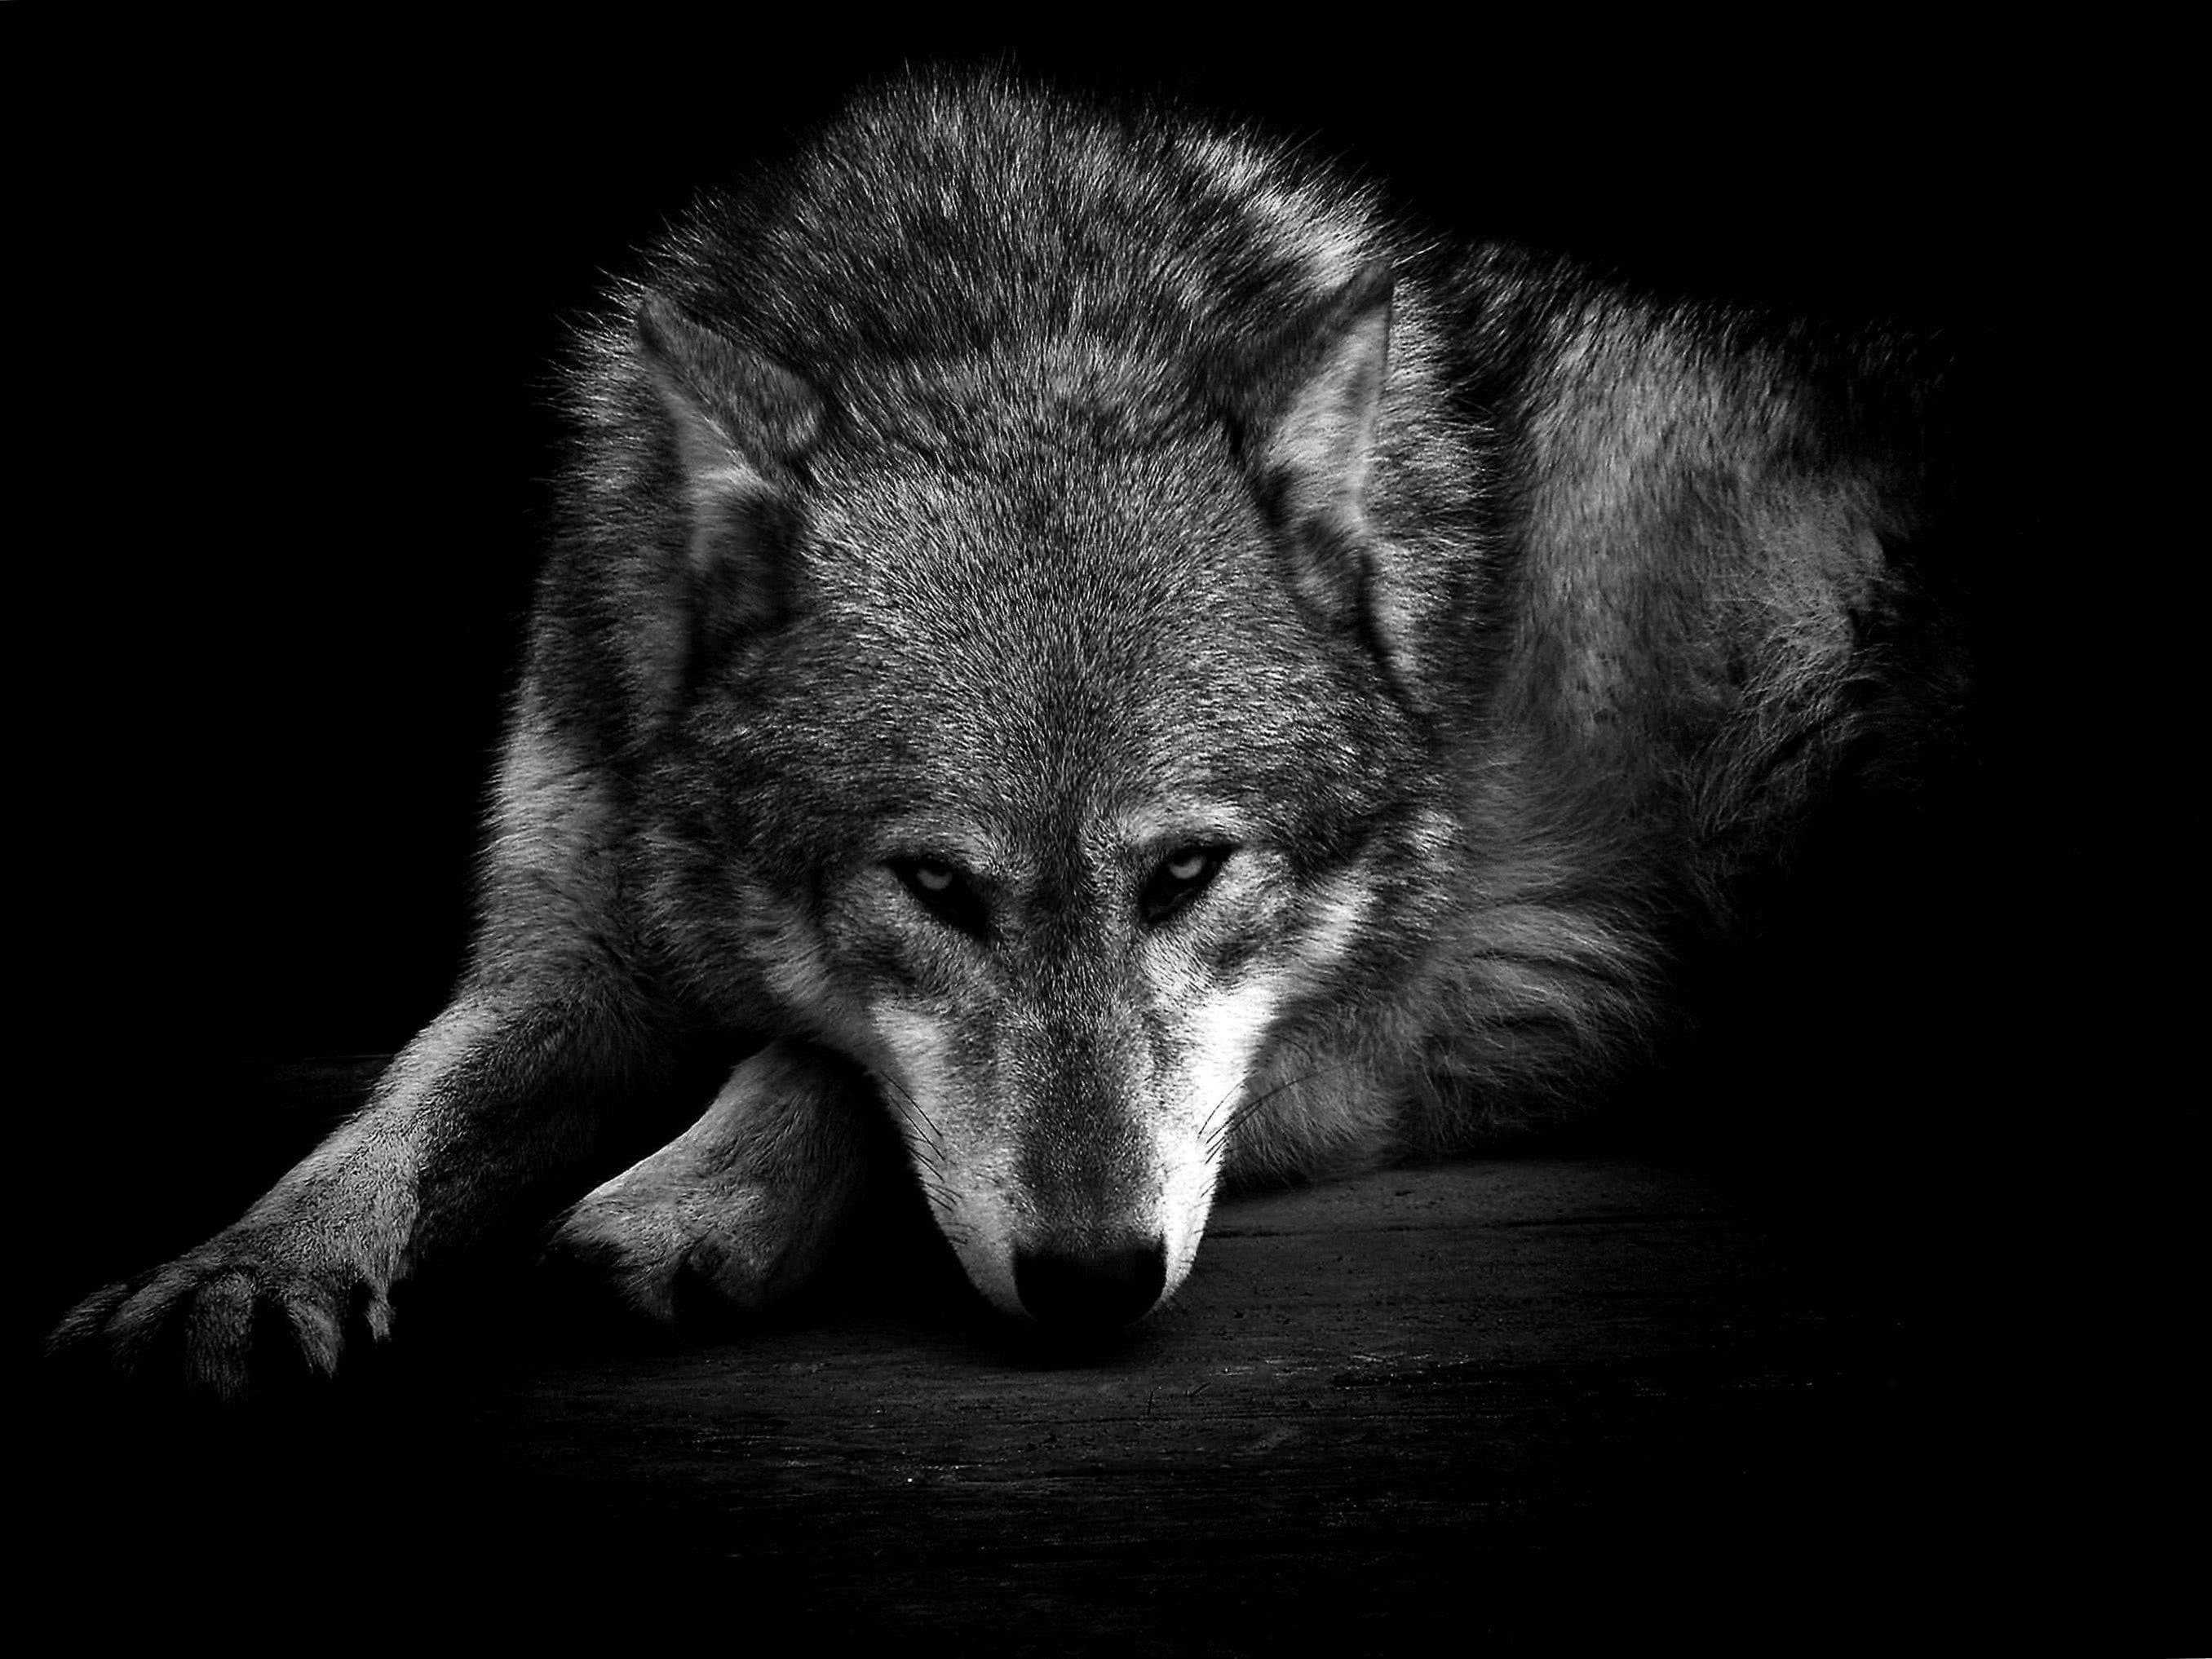 Wolf Wallpaper HD Black